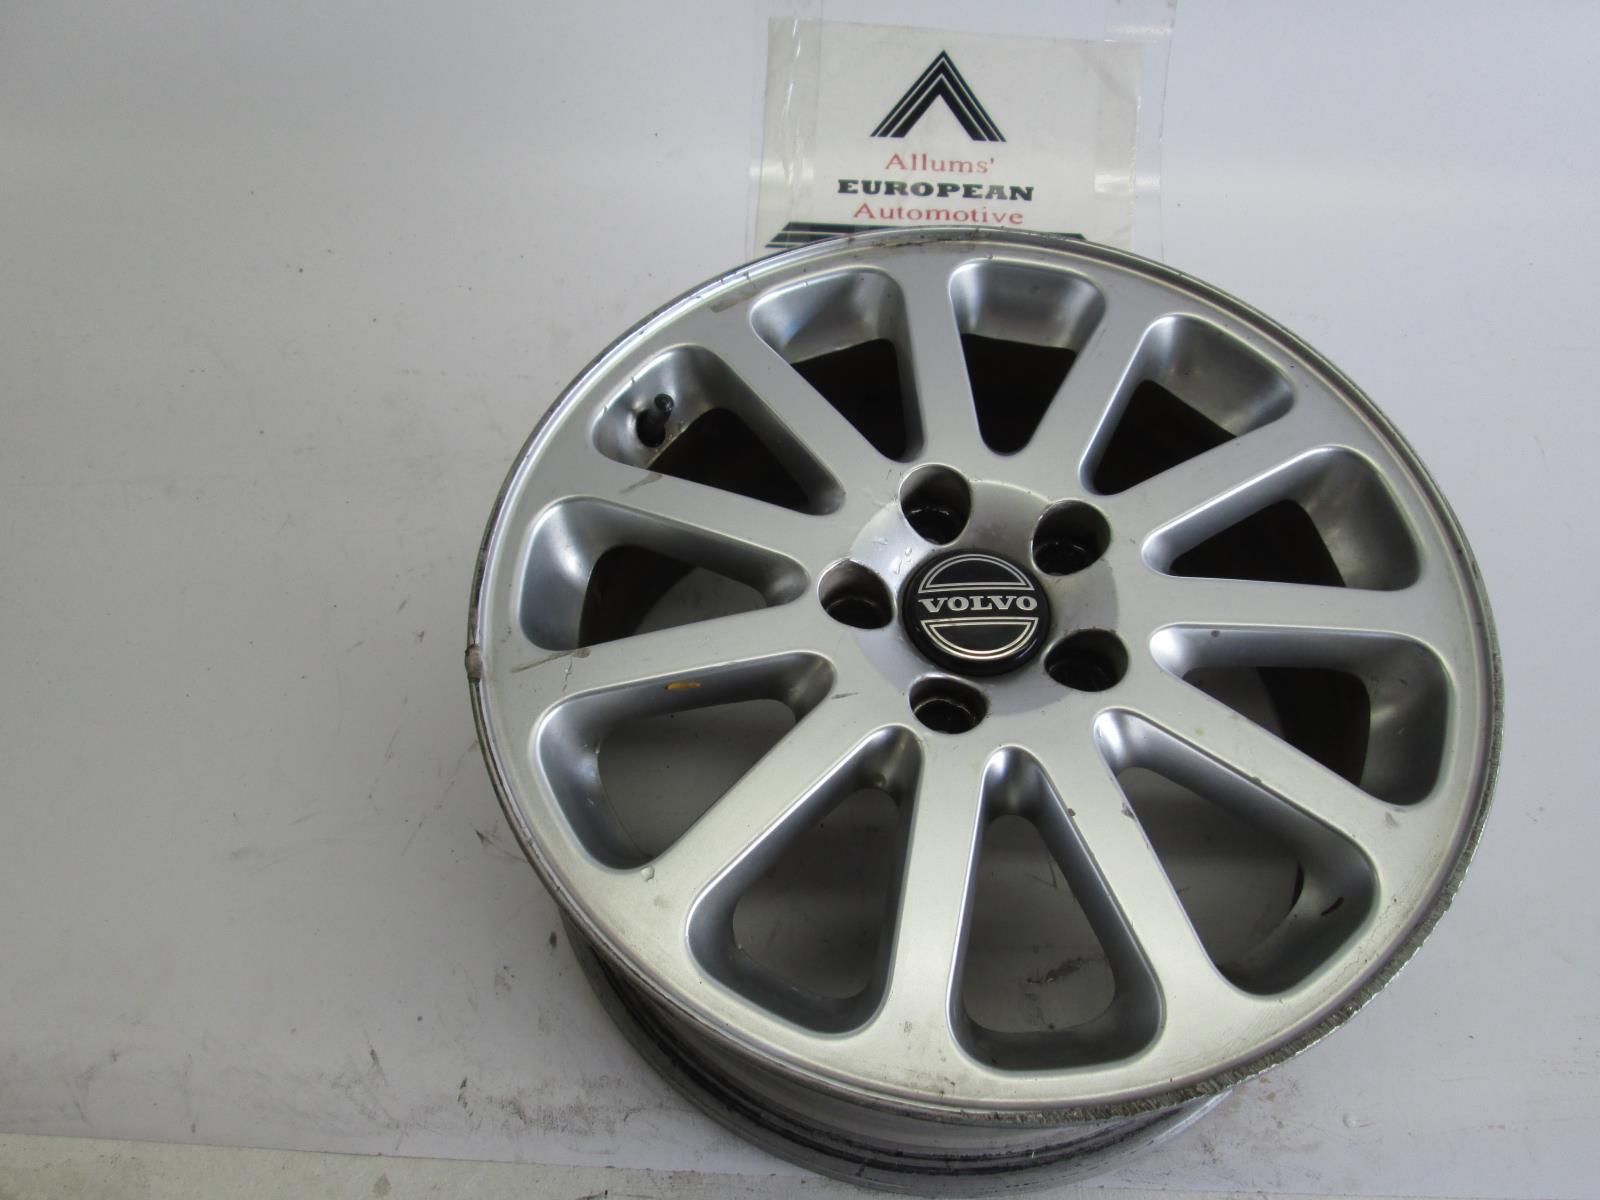 easton wheels awd cars dynamic for new brown lehigh phillipsburg serving htm sale valley bethlehem pa stock daub nazareth volvo nj